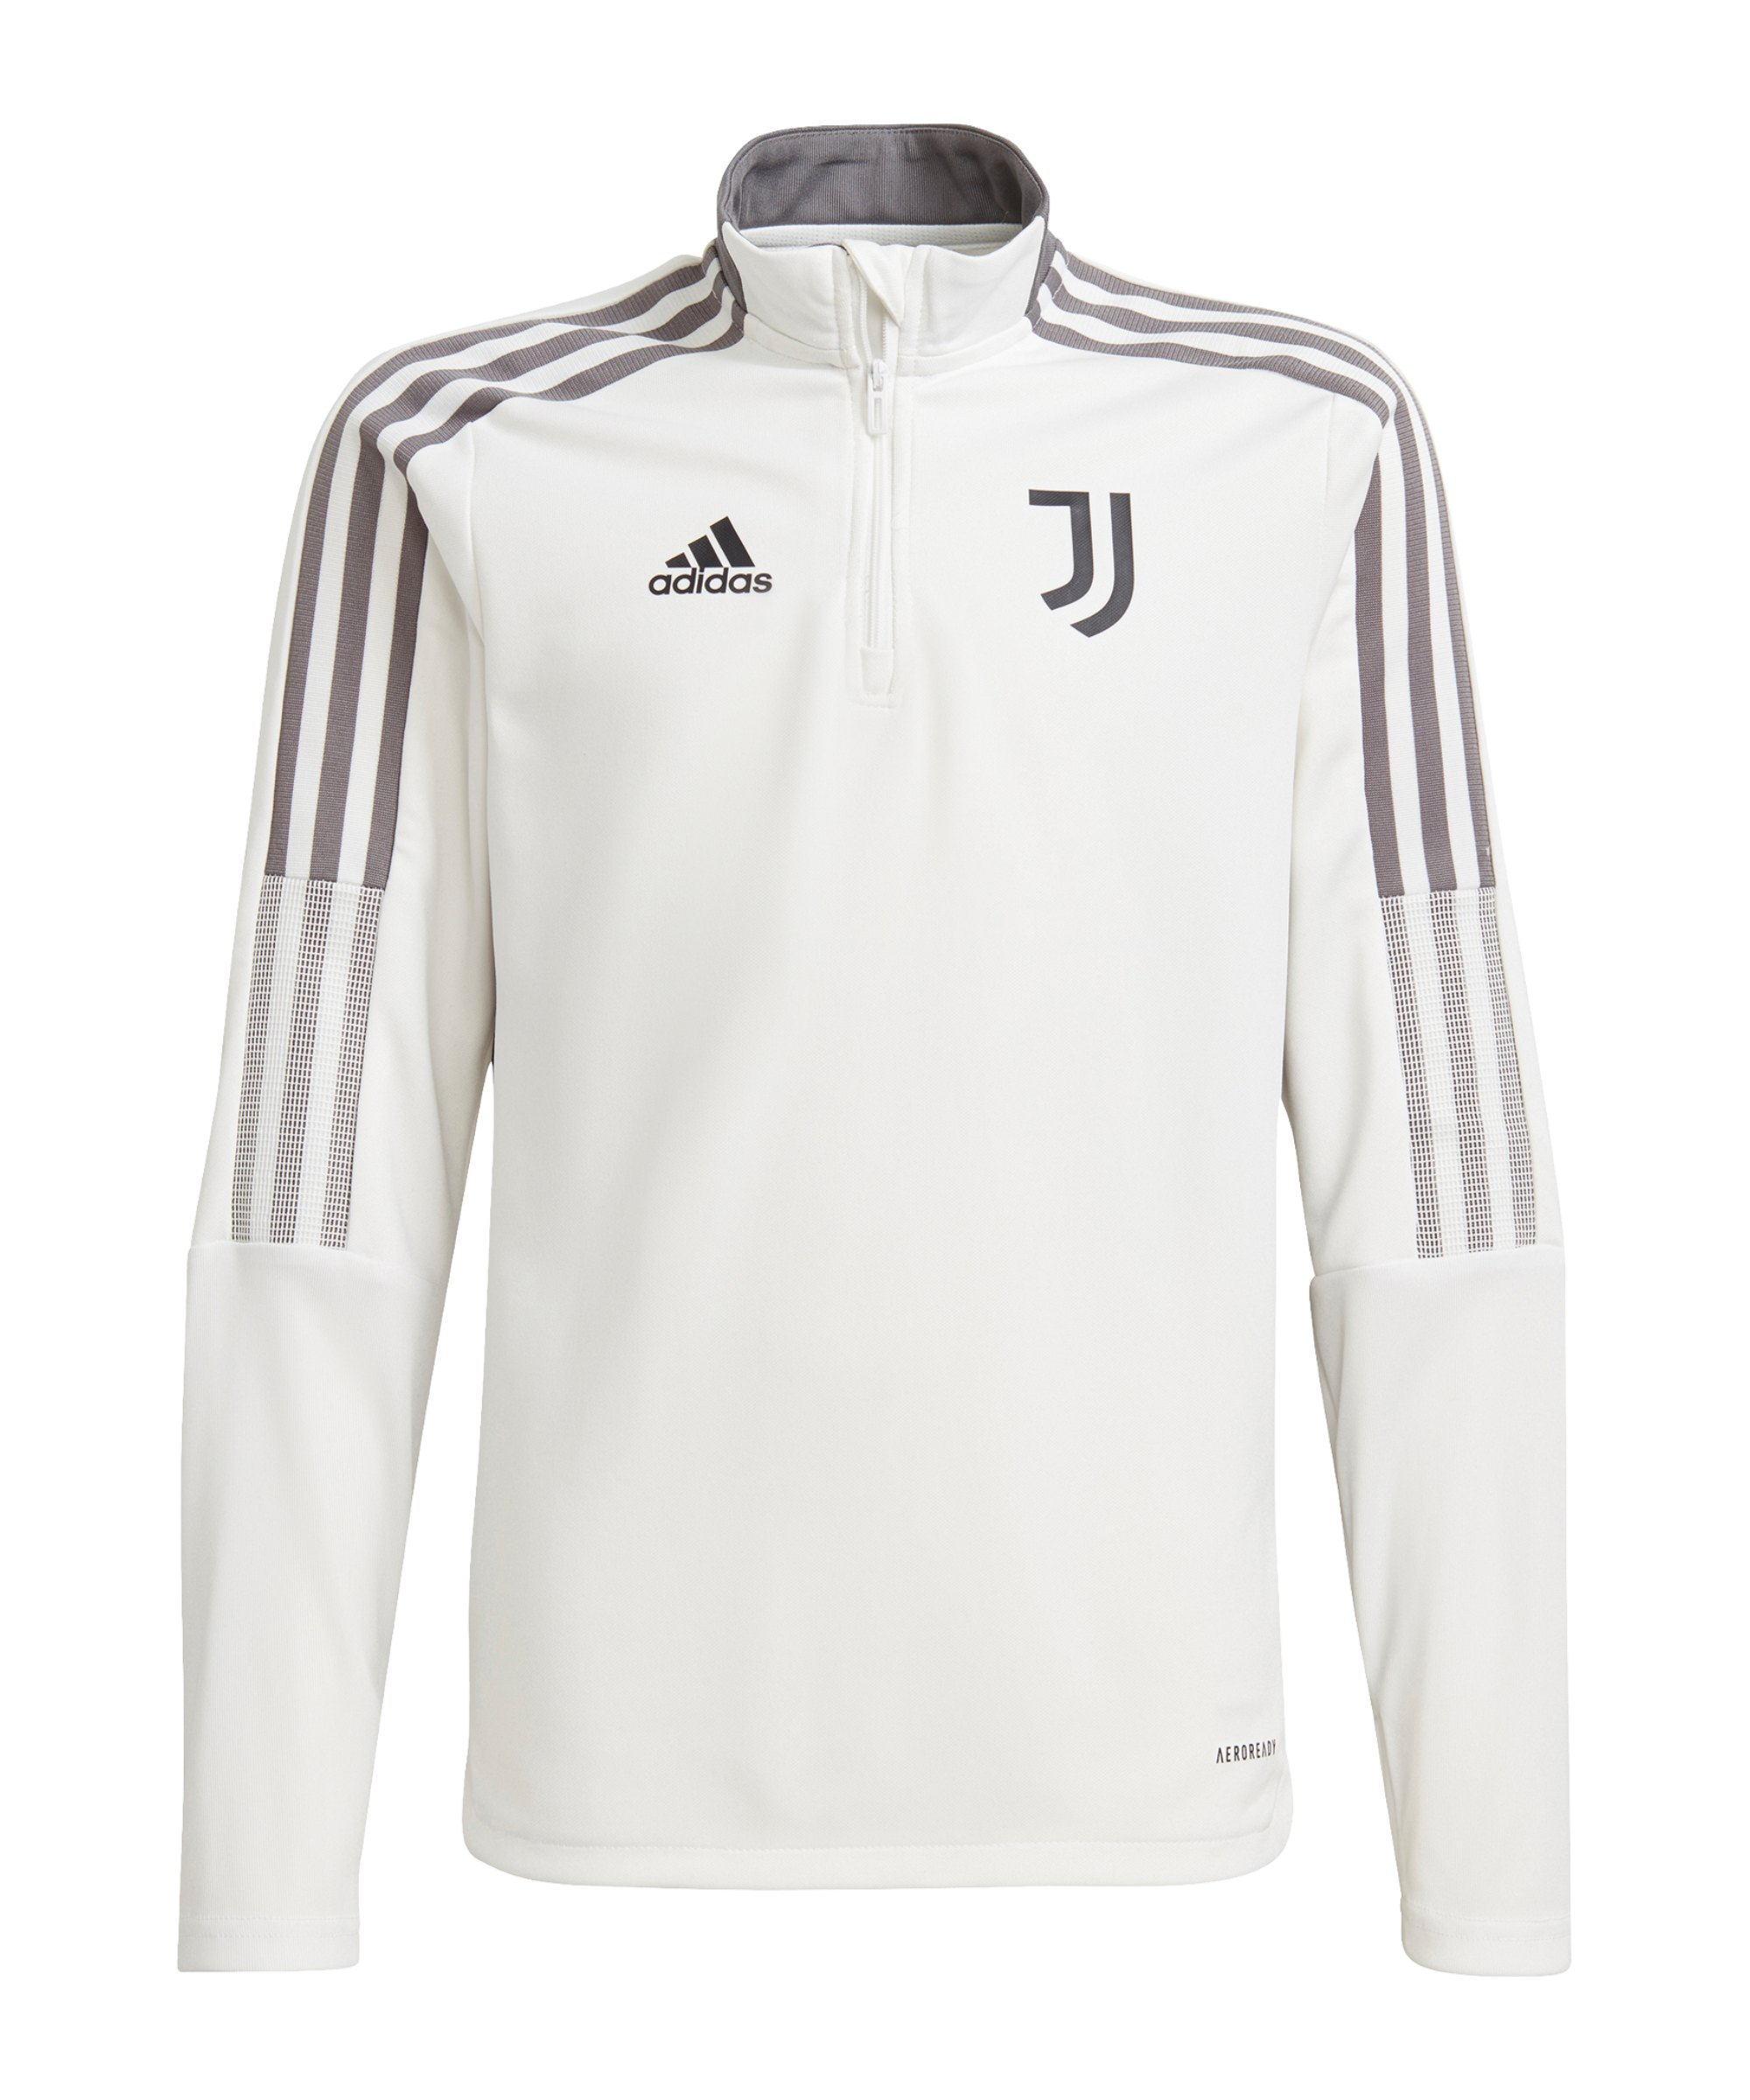 adidas Juventus Turin HalfZip Sweatshirt Kids Weiss - weiss